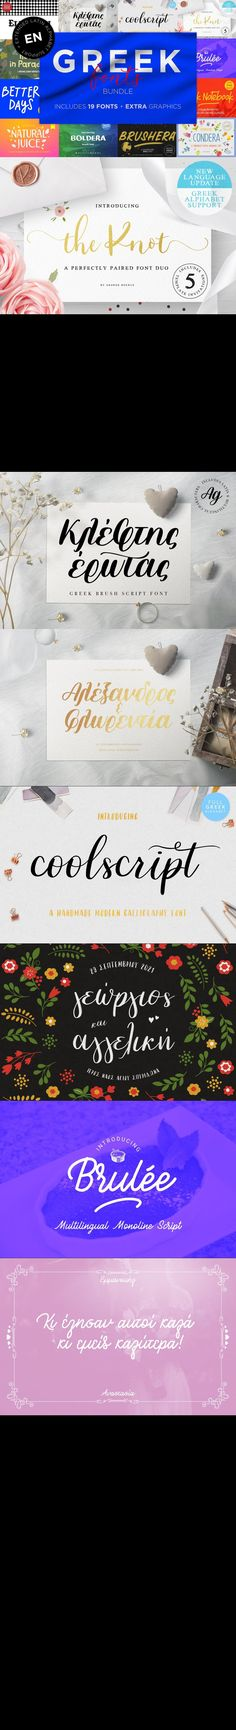 Greek fonts bundle #lettering #greekbrushfont #weddingfont #CalligraphicFont #greekboldfont #ScriptFonts #ScriptFont #greekheadlinefont #greeksvgfont #greekfontduo #weddingfont #weddingfont #greekfontbundle #opentypefont #greekbrushfont #fontsbundle #font #webopenfontformat #beauty Cursive Fonts, Handwritten Fonts, Calligraphy Fonts, Typography Fonts, Typography Design, Lettering, Open Fonts, Bold Fonts, Greek Font